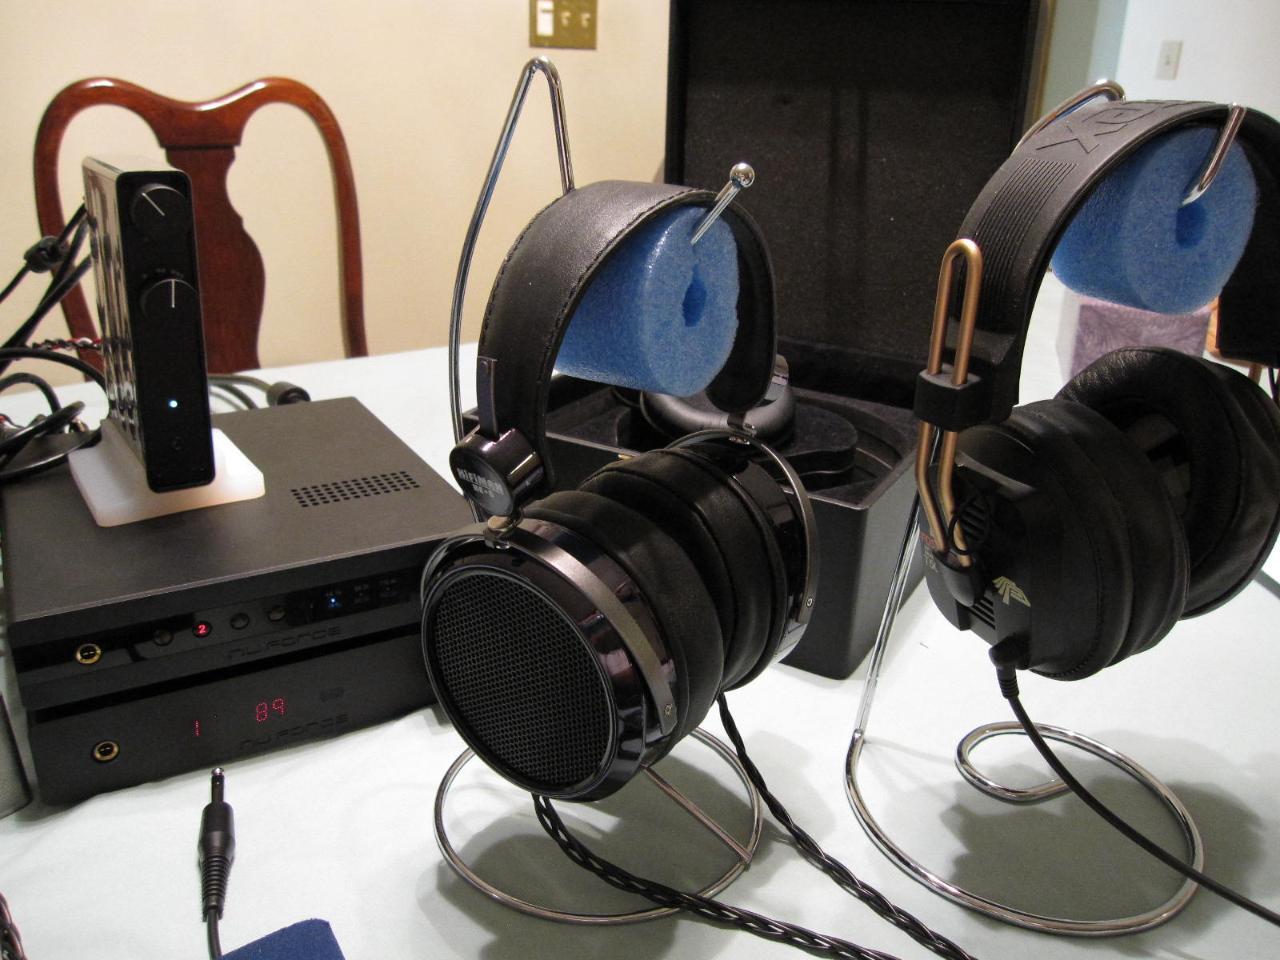 HE-6 w/J$ Beyer pads, next to a modded Foxtex T50rp w/J$ Beyer pads